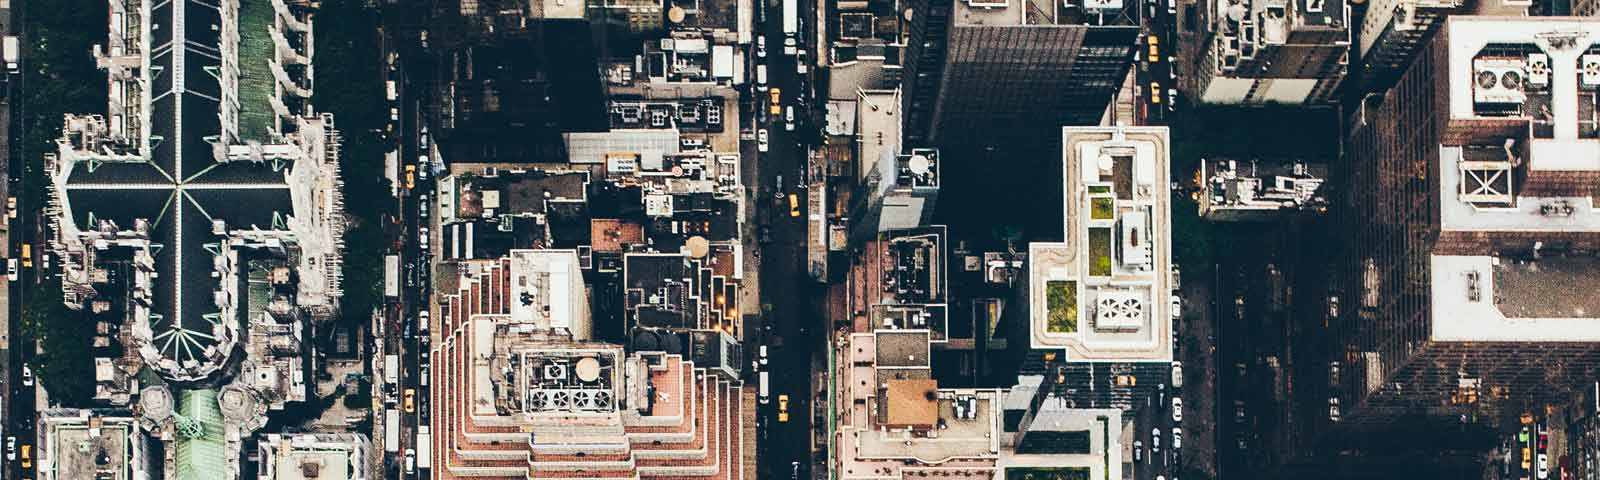 Overhead shot of an urban city area